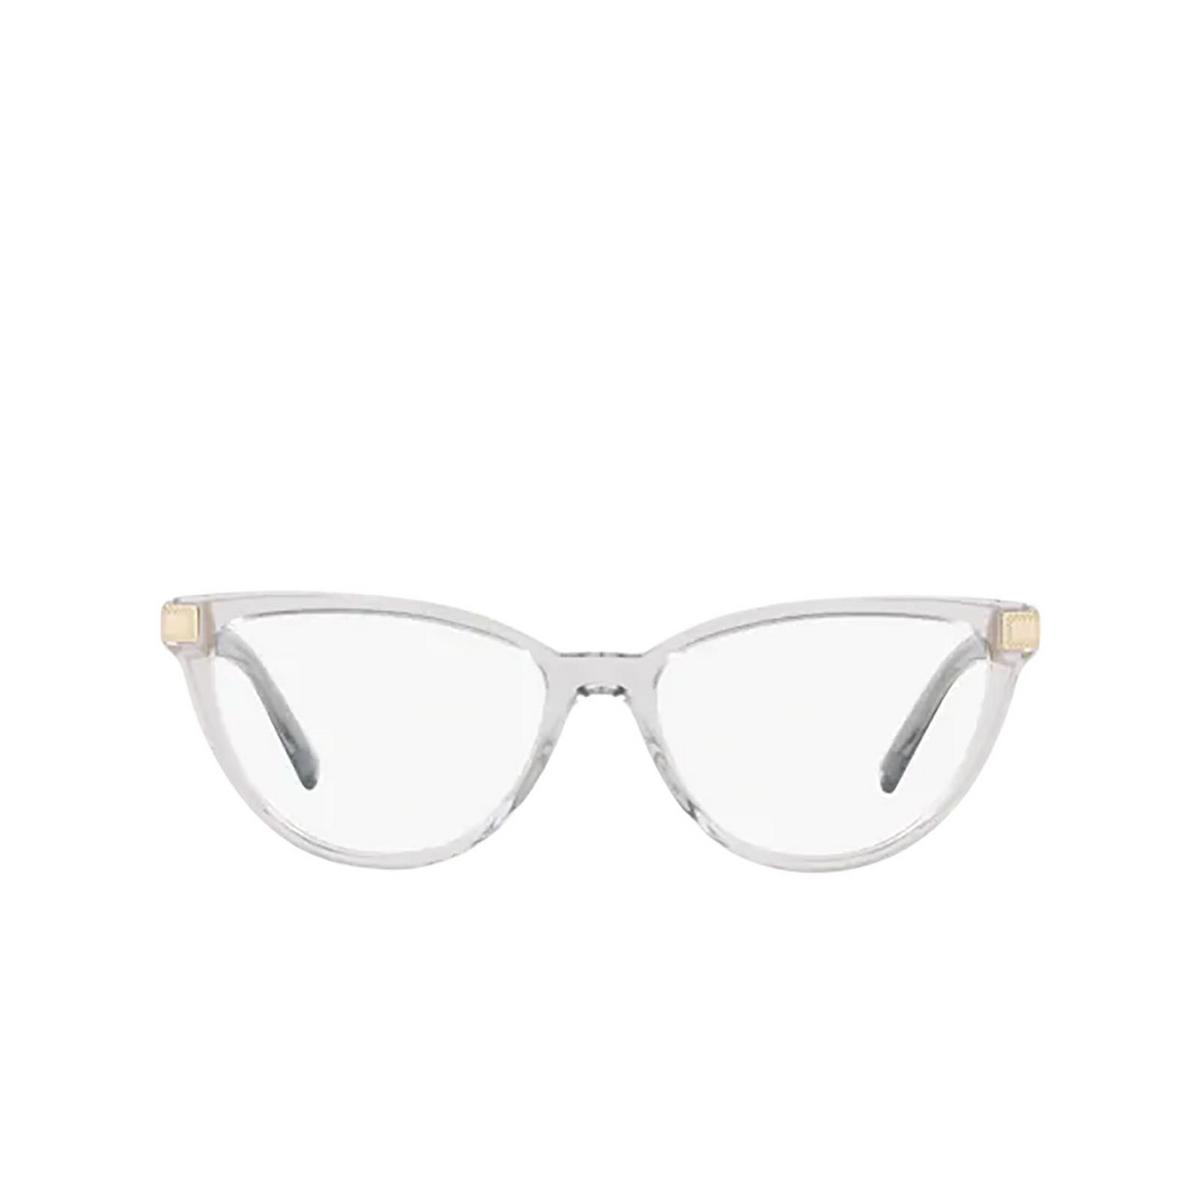 Versace® Cat-eye Eyeglasses: VE3271 color Transparent Grey 5305 - front view.